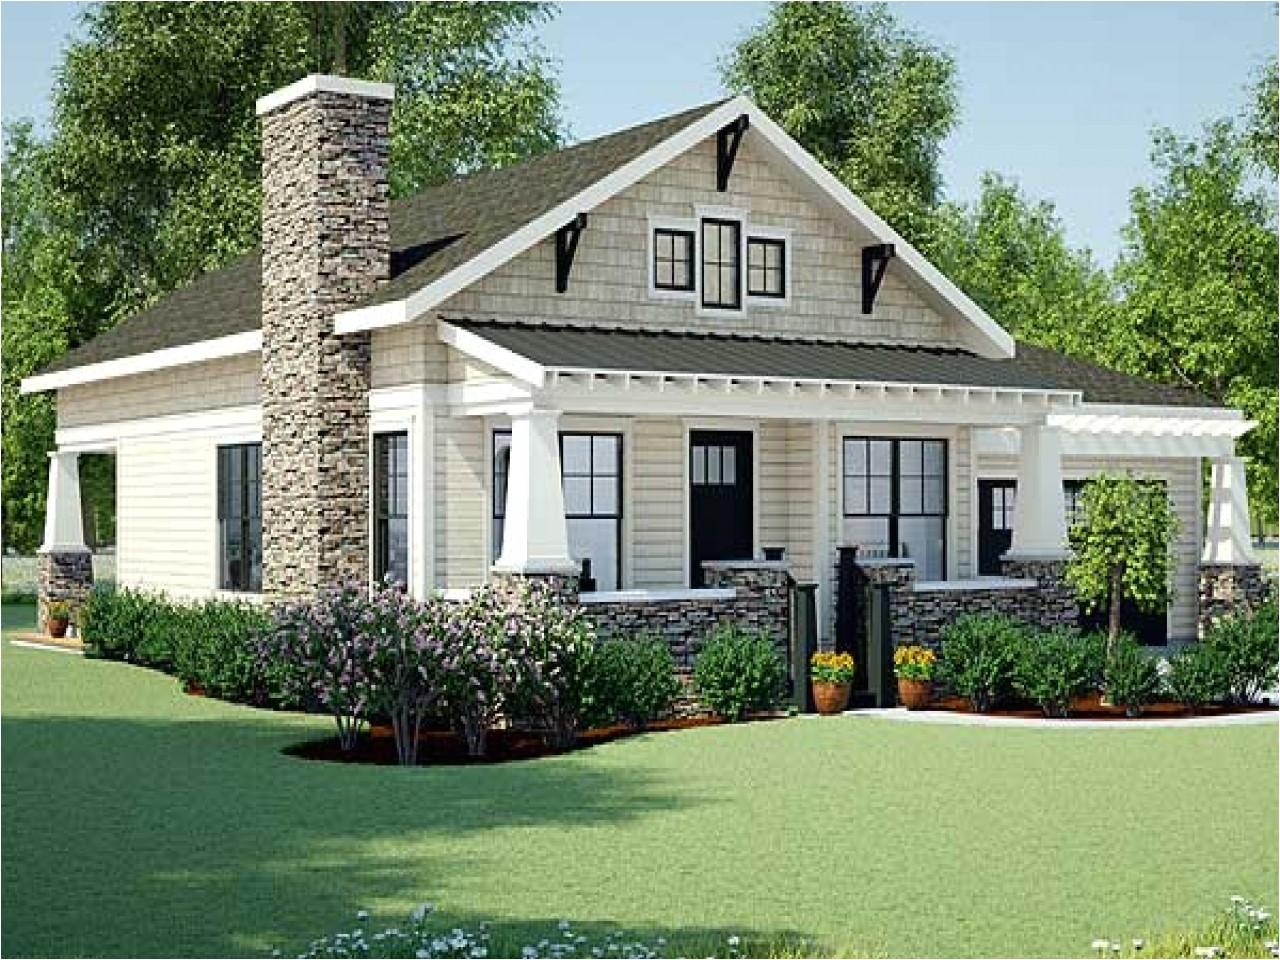 b3eaf3a3b40e3902 shingle style cottage home plans new england beach cottages